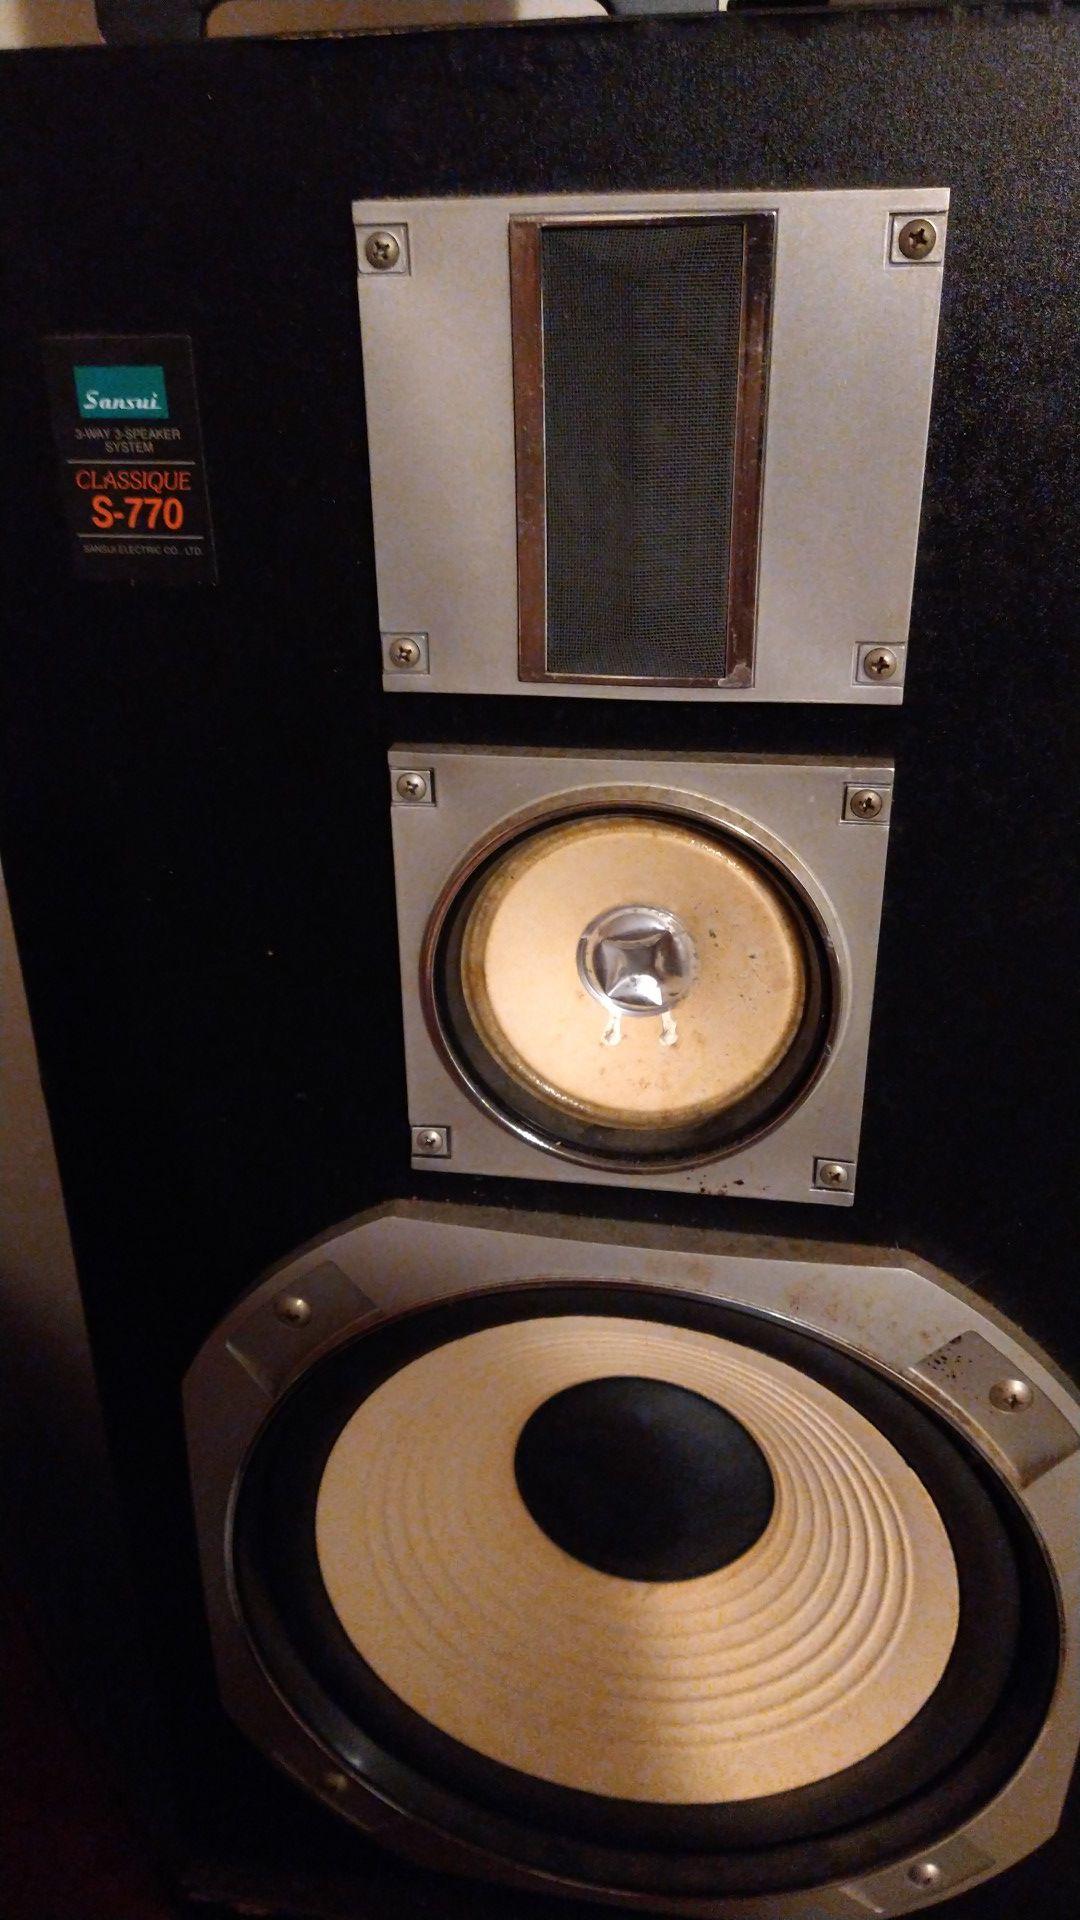 Sansui and acoustic response speakers vintage